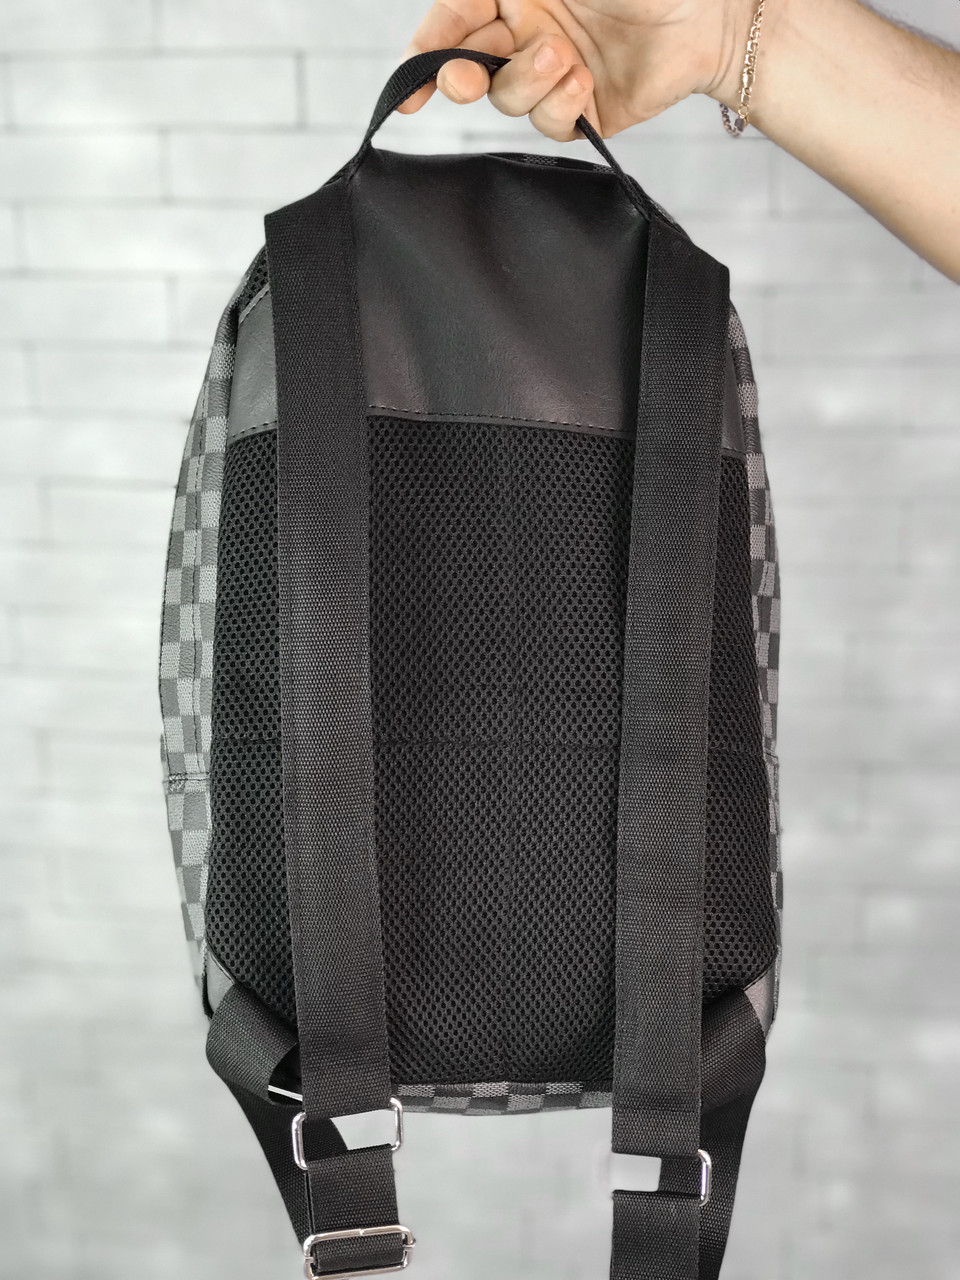 f450f439de73 Рюкзак Louis Vuitton | Луи Витон (реплика): продажа, цена в Киеве ...